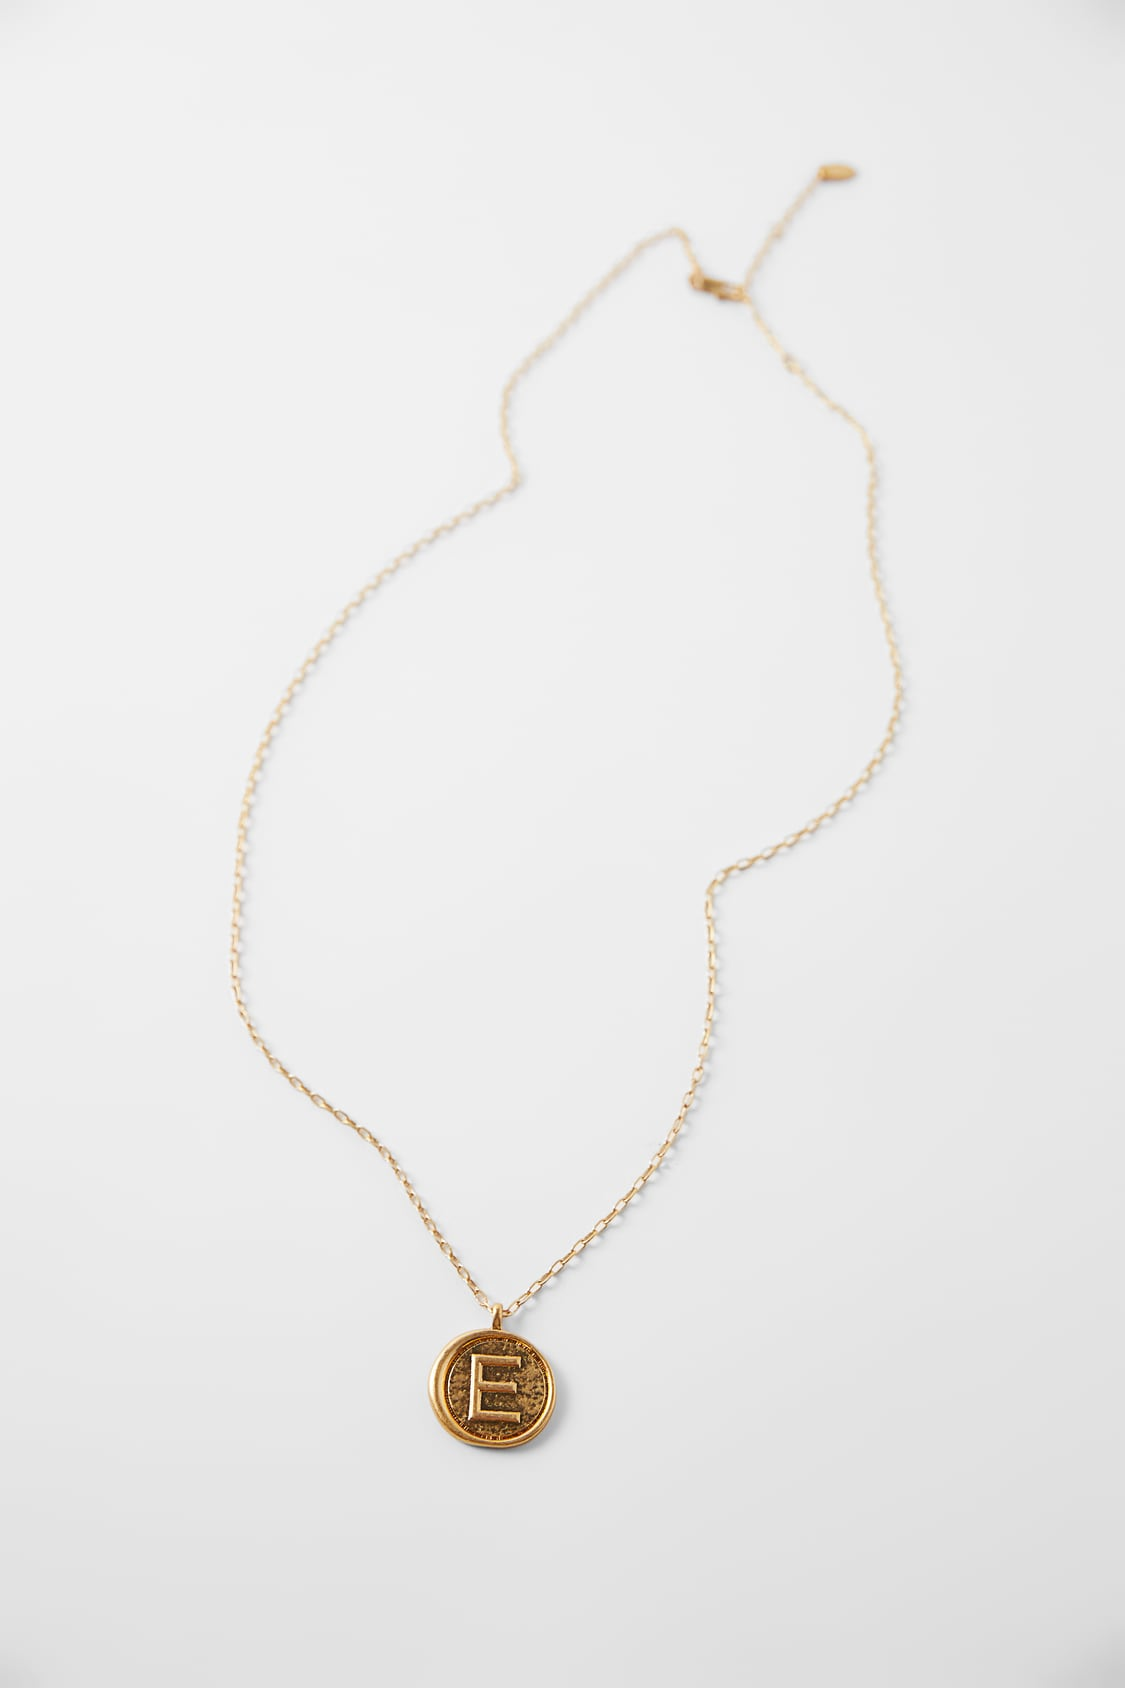 ZARA的图片 1 名称字母圓牌吊飾項鏈